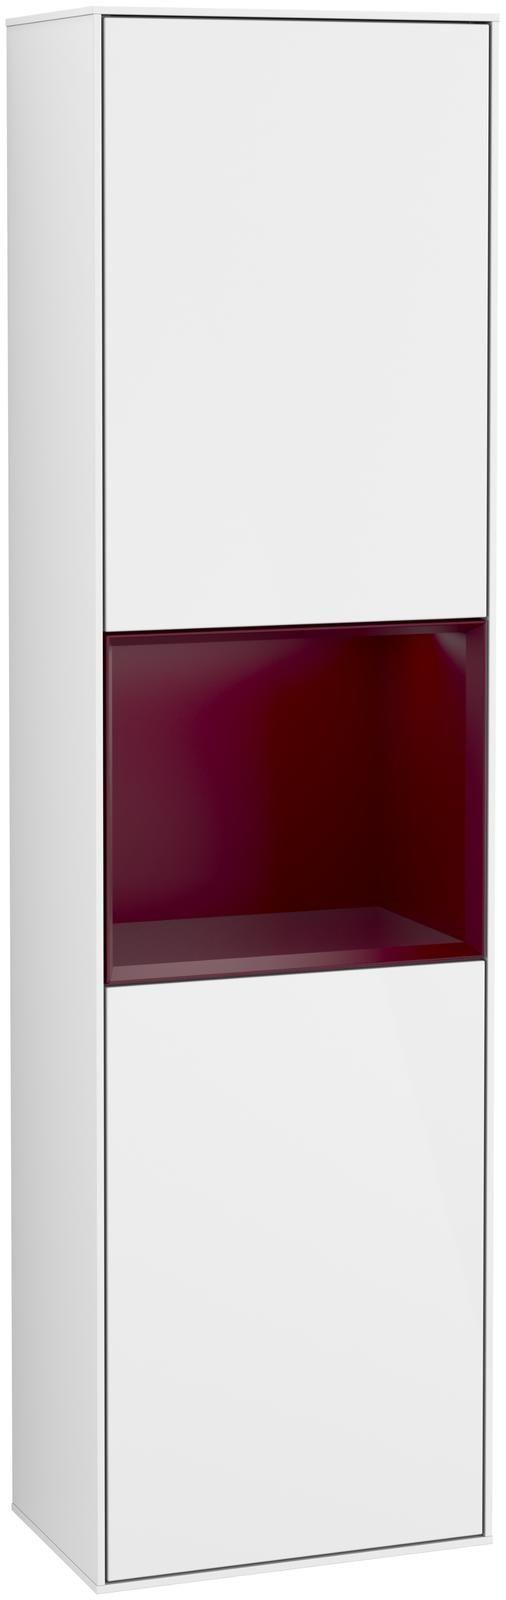 Villeroy & Boch Finion F46 Hochschrank mit Regalelement 2 Türen Anschlag links LED-Beleuchtung B:41,8xH:151,6xT:27cm Front, Korpus: Glossy White Lack, Regal: Peony F460HBGF